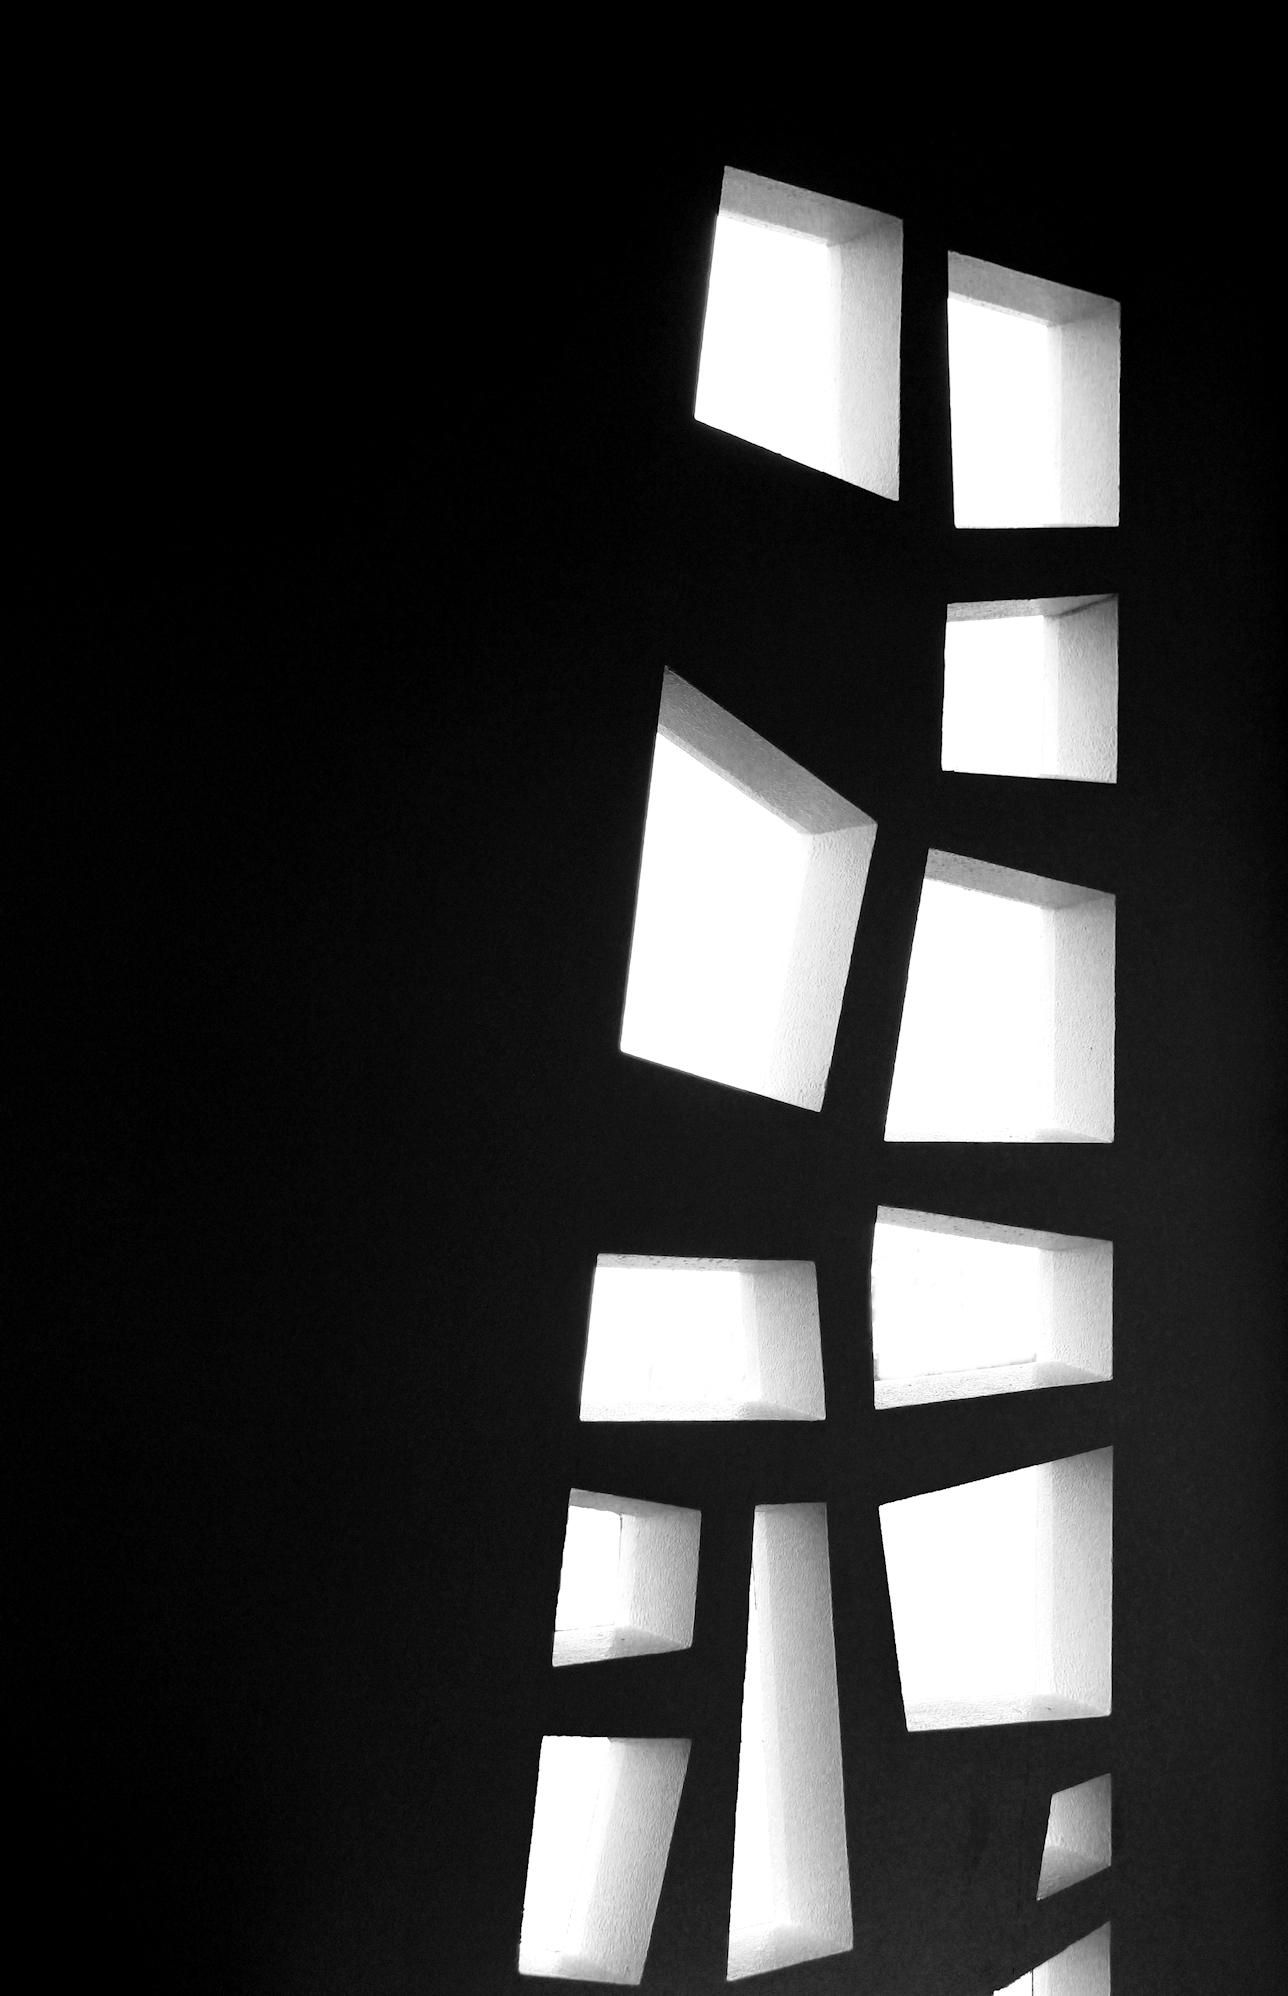 Tree of Life - Photography20 x 30